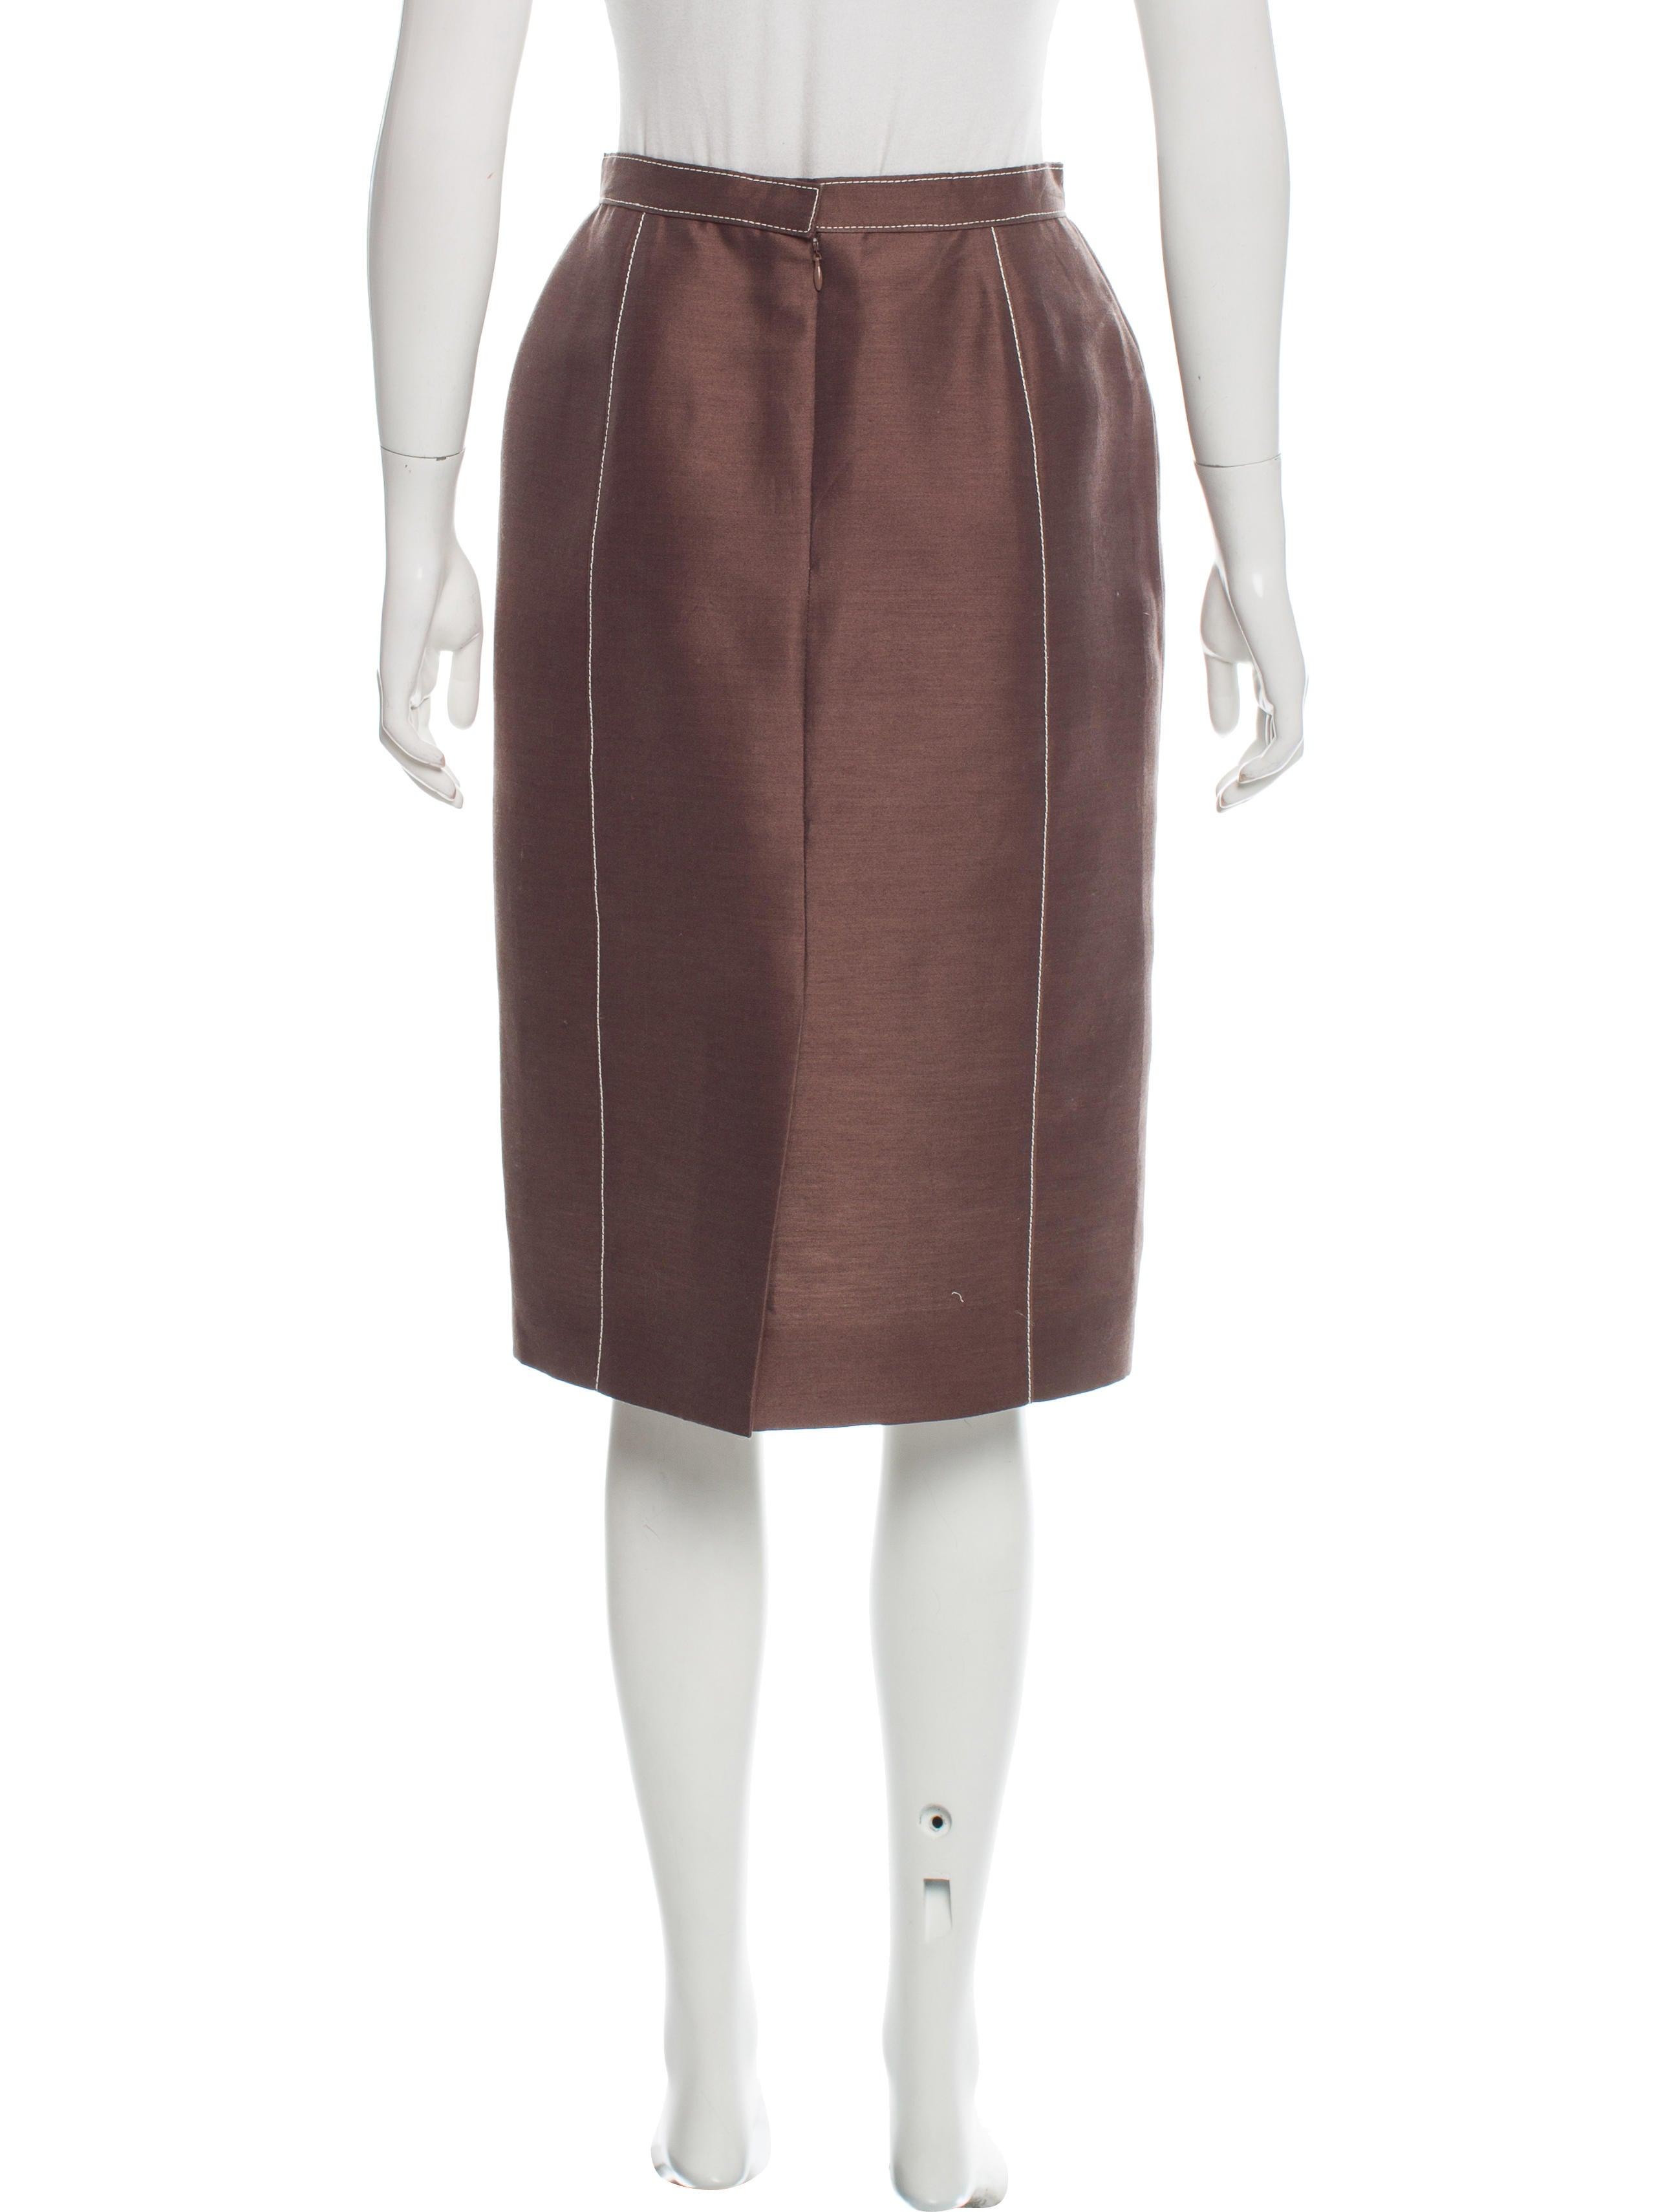 Carolina Herrera Knee-Length Pencil Skirt